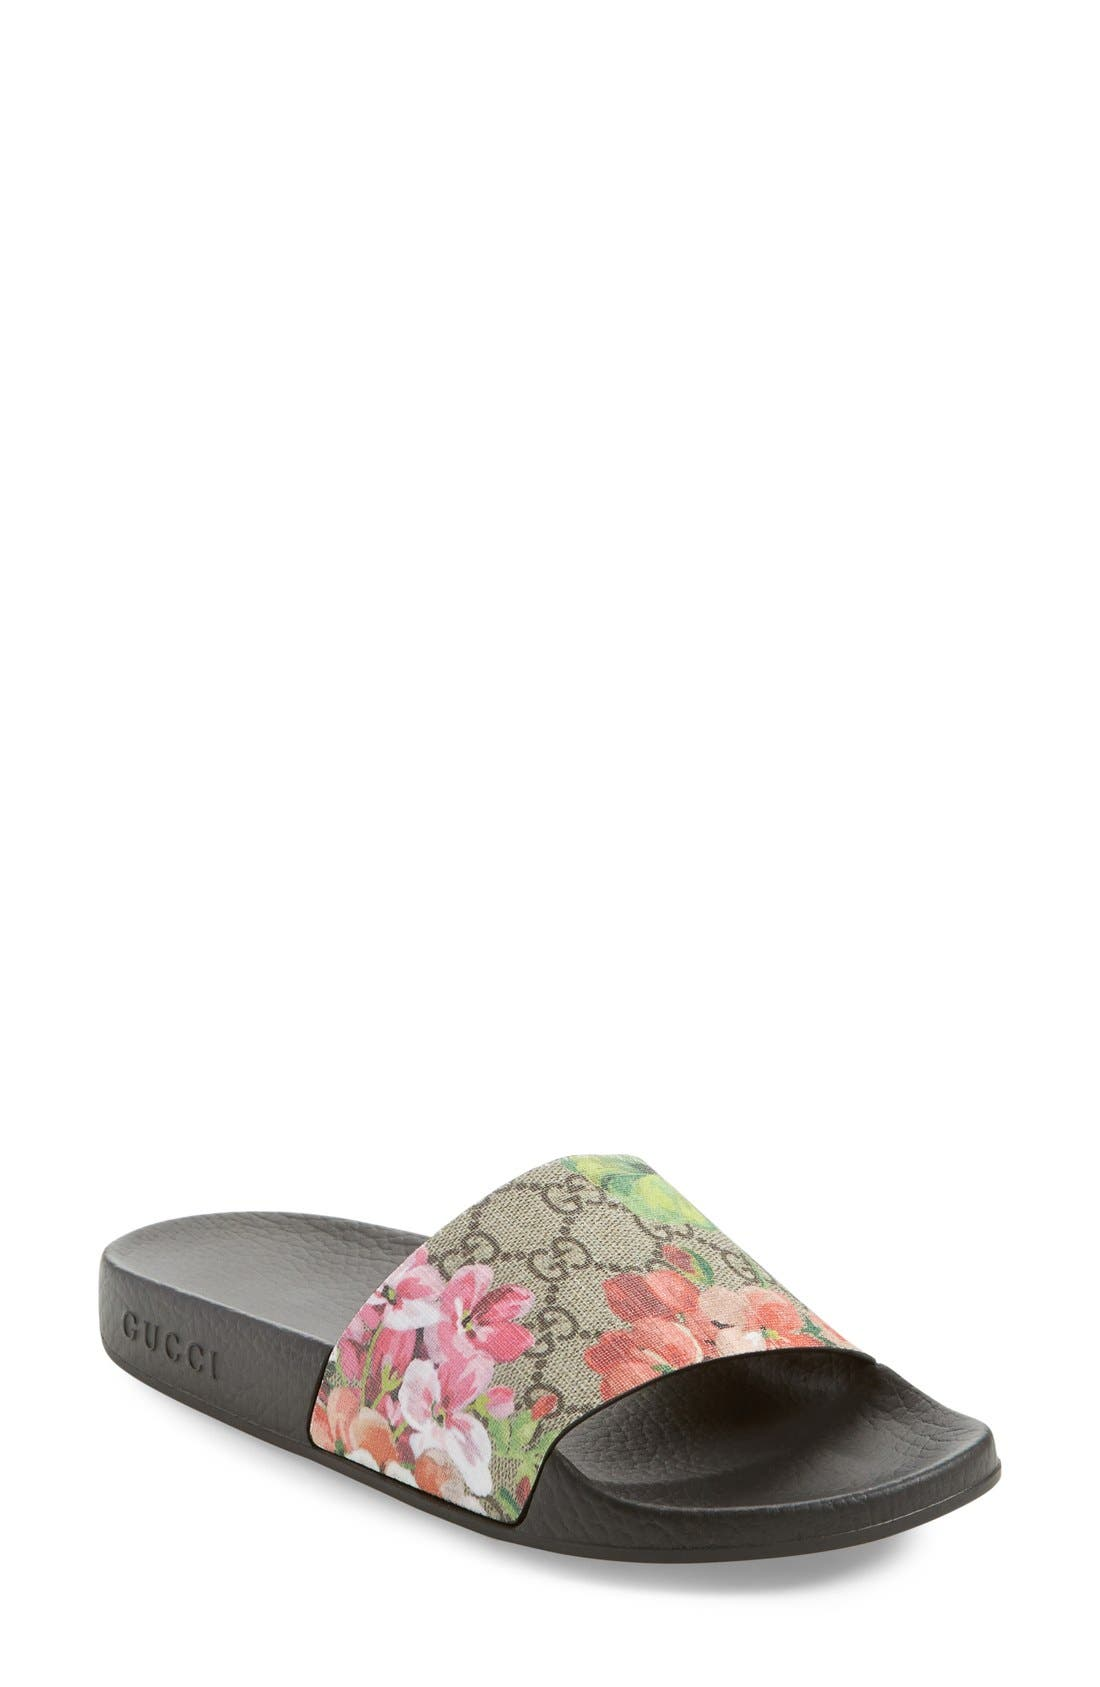 Slide Sandal,                             Main thumbnail 1, color,                             MULTI COLOR FABRIC